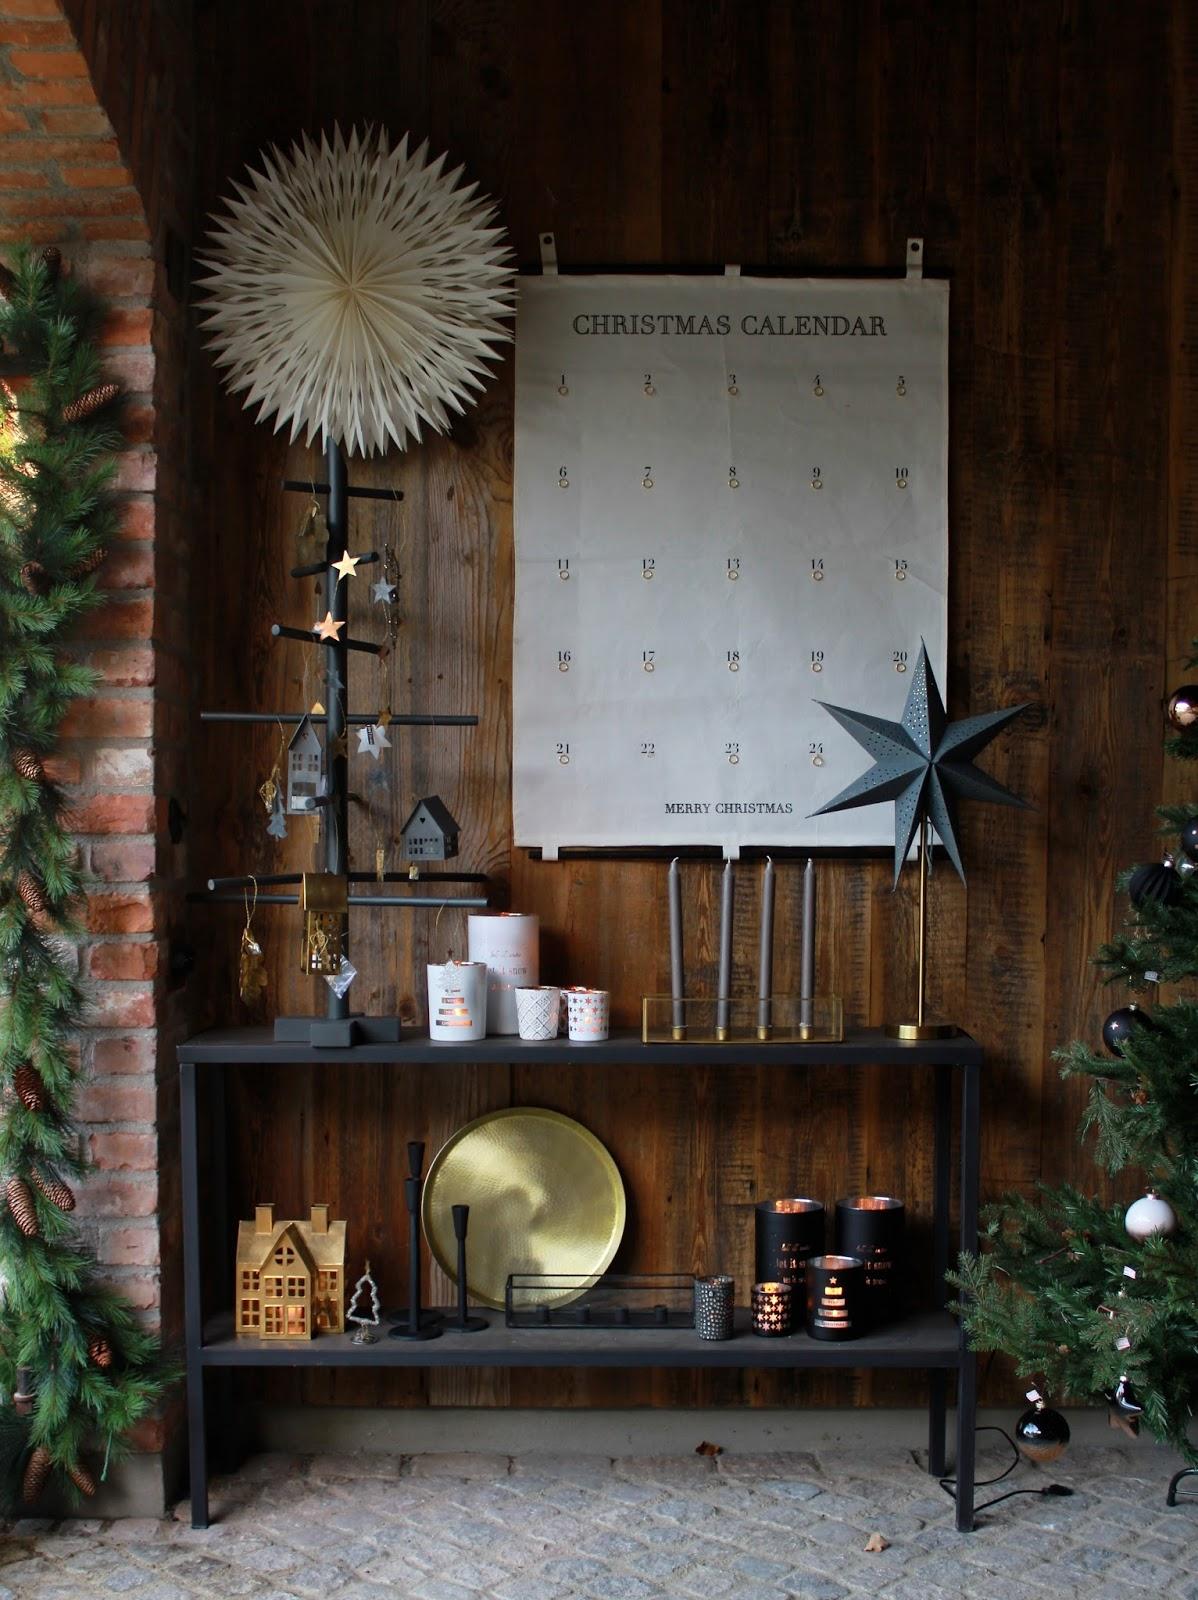 Blogg Home and Cottage: oktober 2016